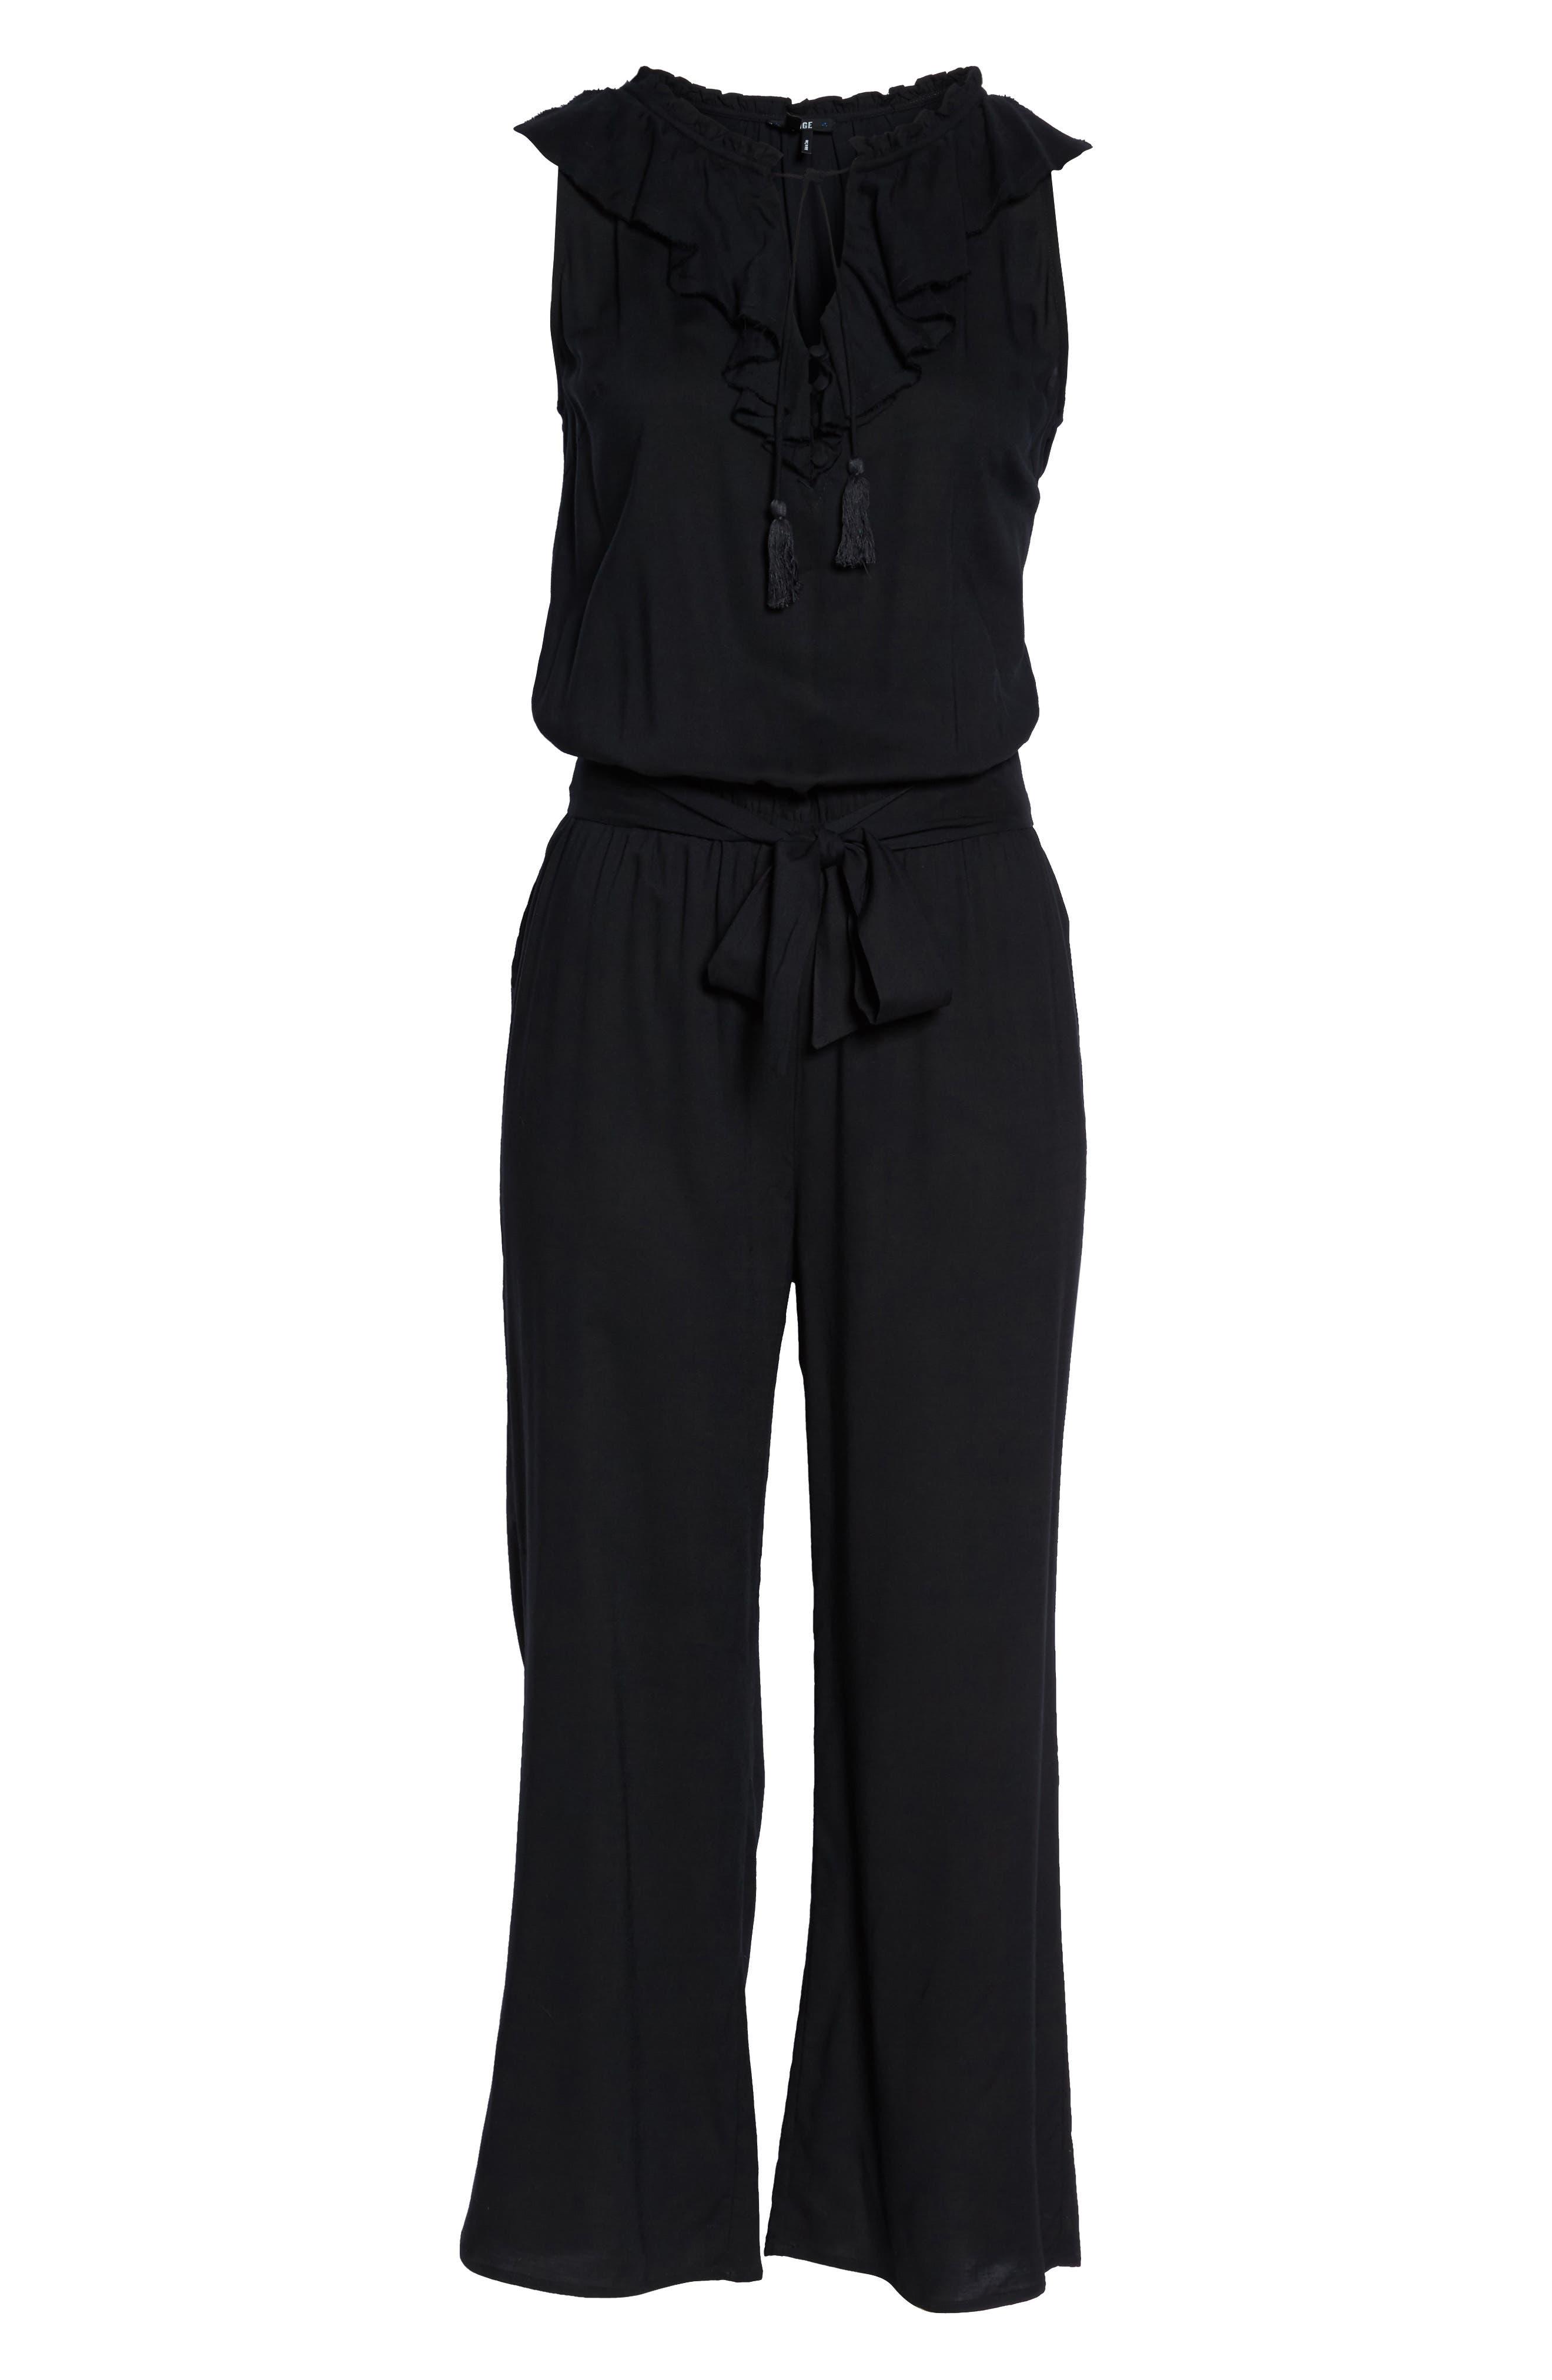 Paletta Ruffle Neck Jumpsuit,                             Alternate thumbnail 6, color,                             BLACK